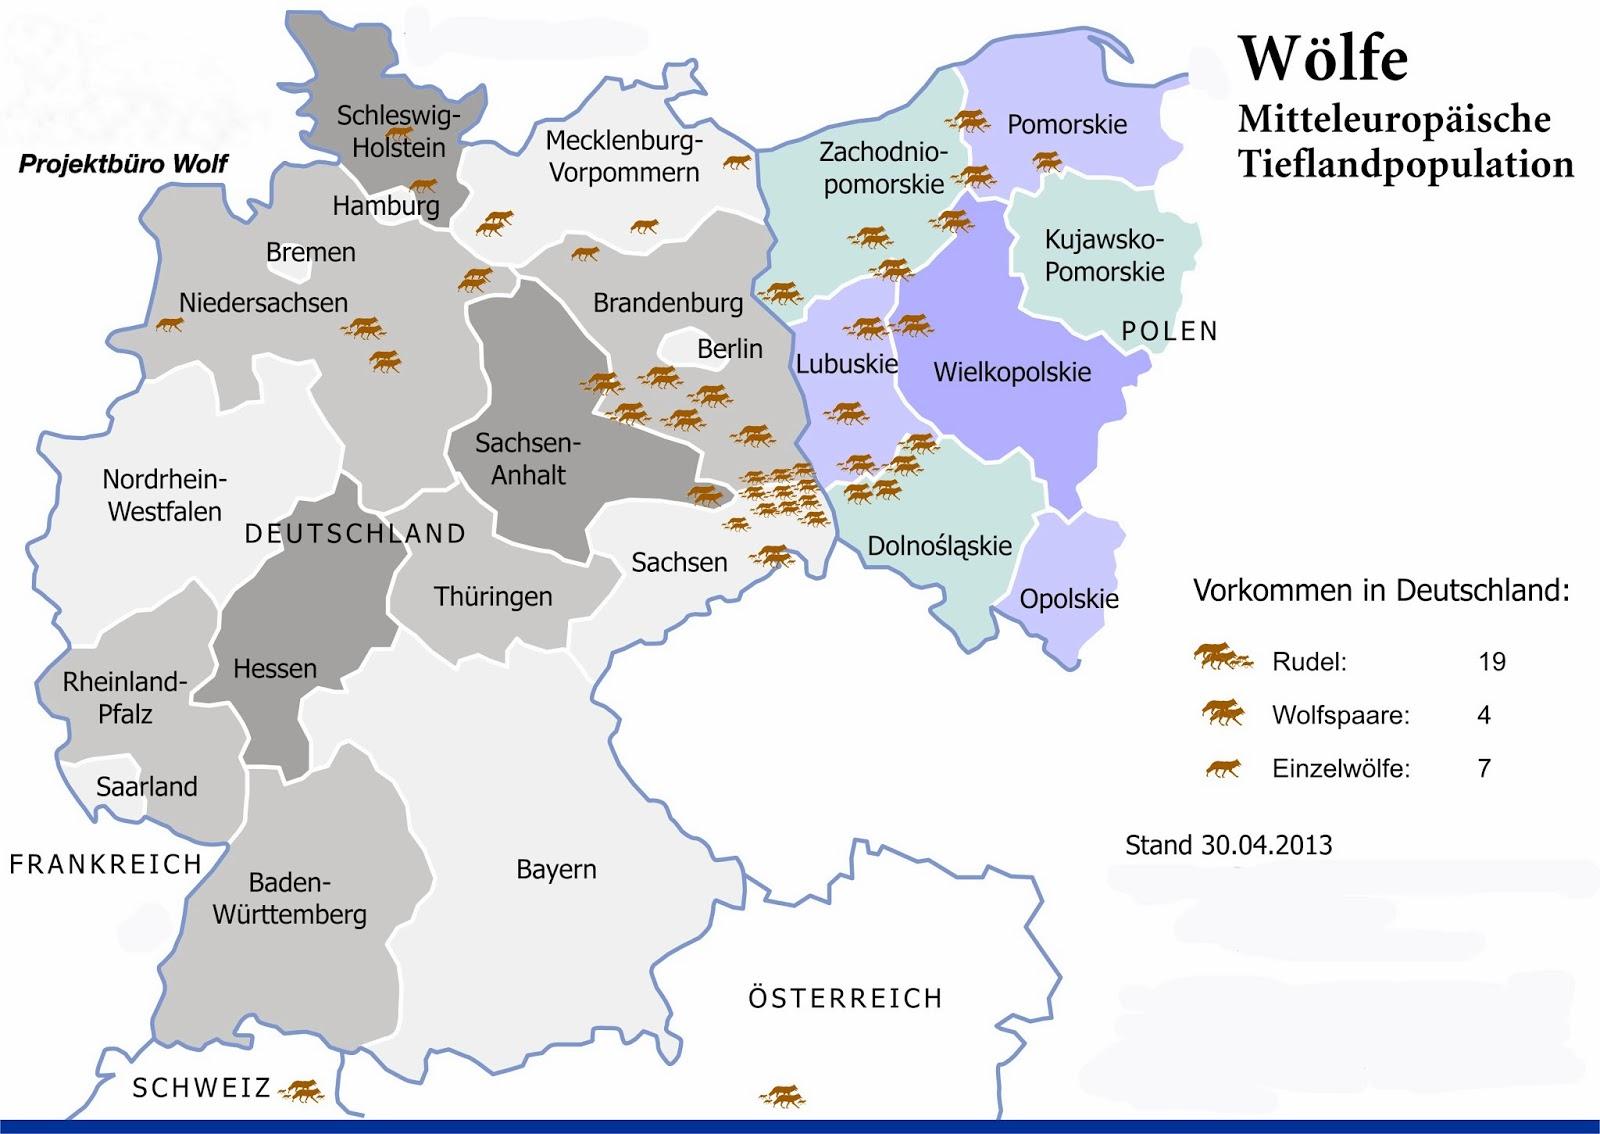 Wölfe In Brandenburg Karte.Wölfe